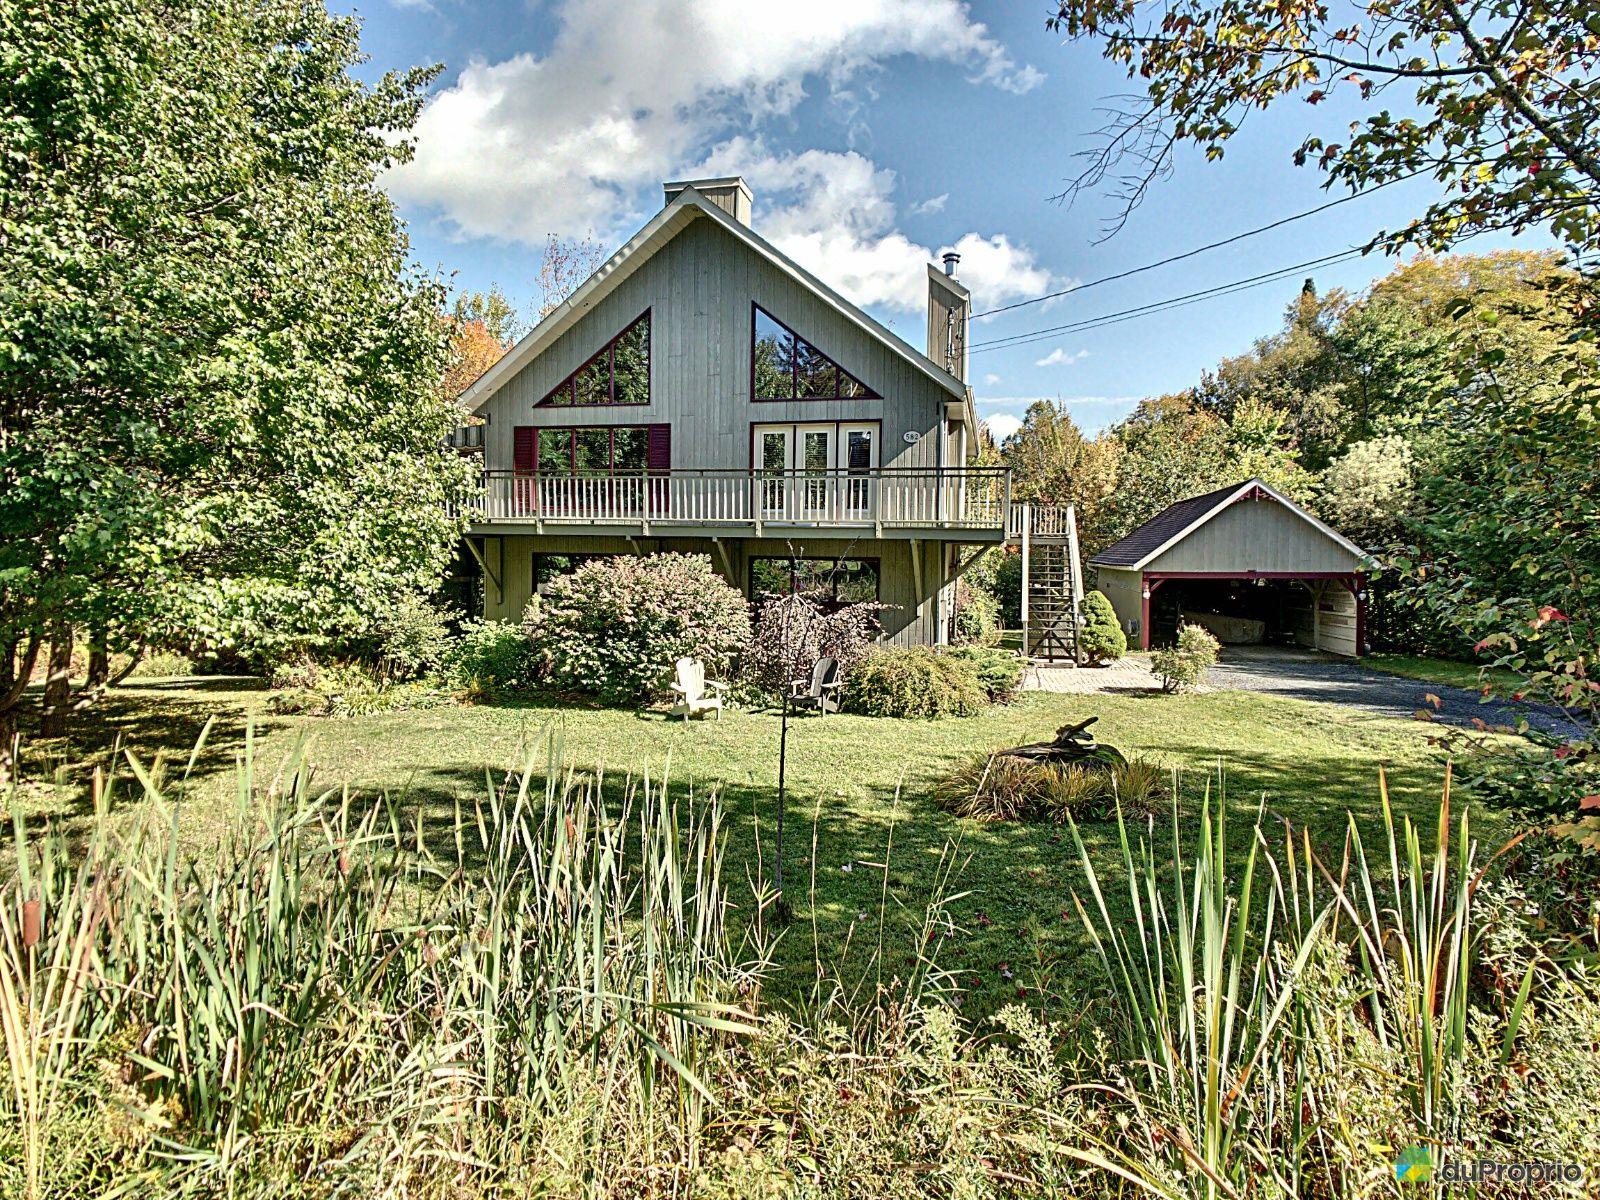 582 chemin Jackrabbit, Piedmont for sale